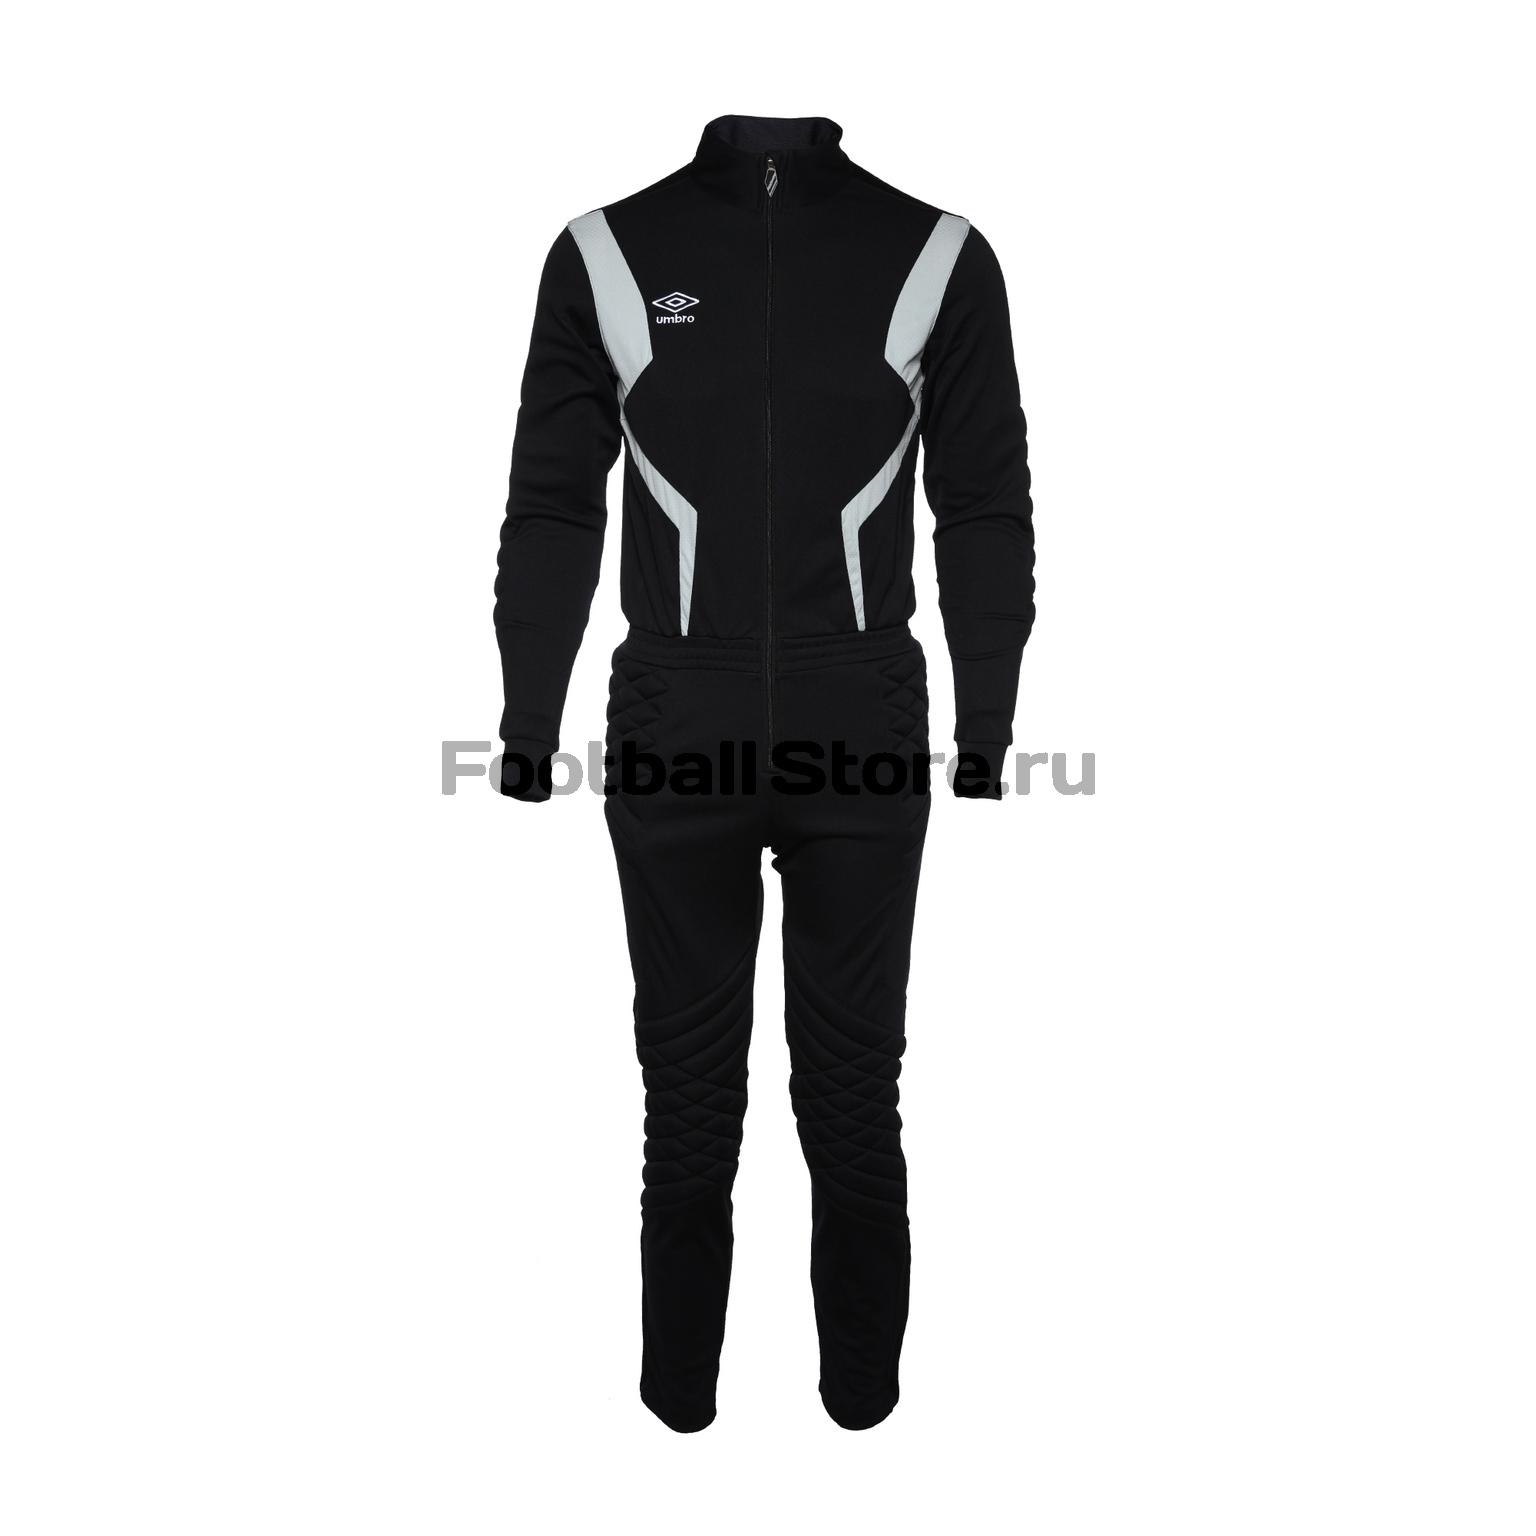 Комбинезон вратарский Umbro GK Padded Suit 200114-681 from panamax to panamix